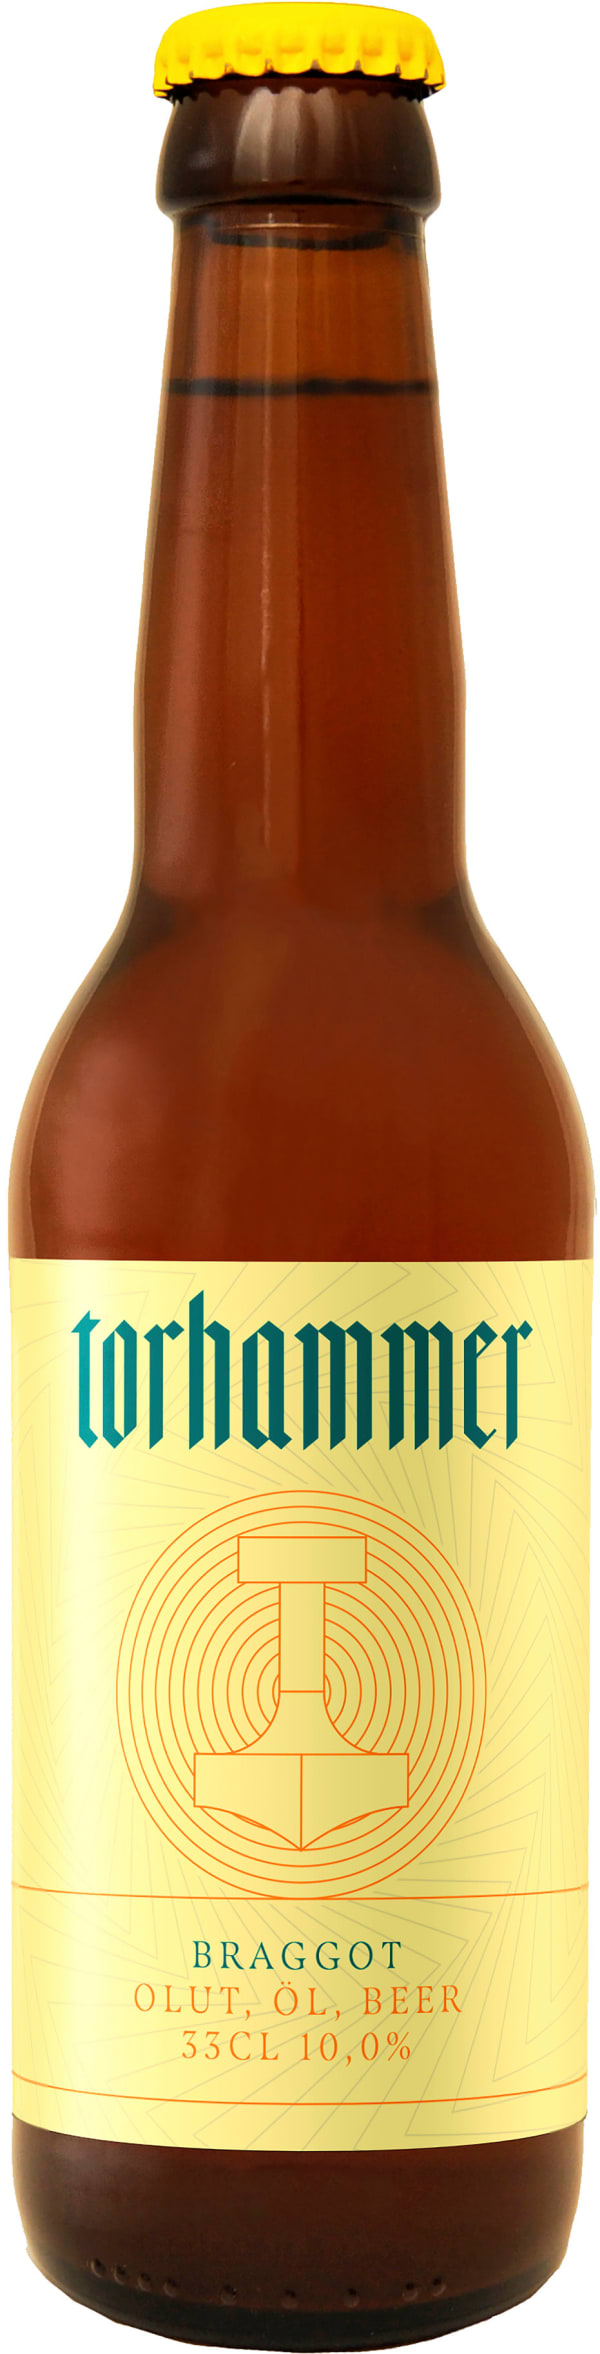 Mallaskuun Torhammer Braggot